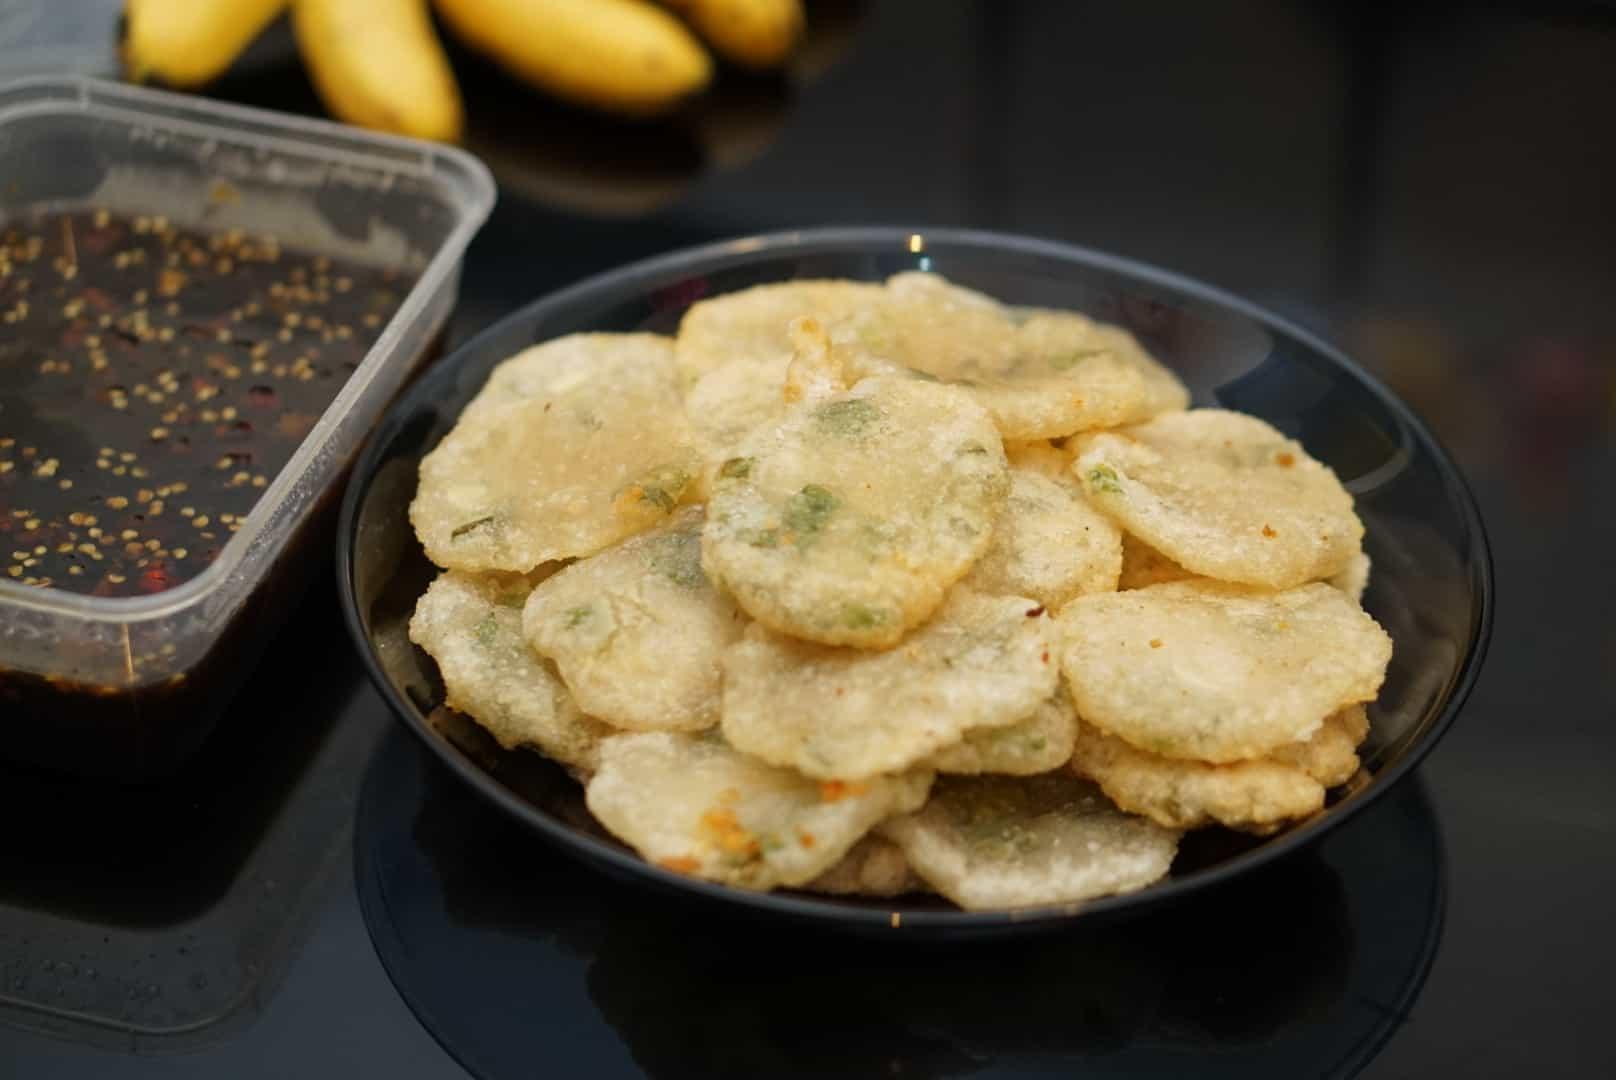 gambar makanan khas bandung Cireng